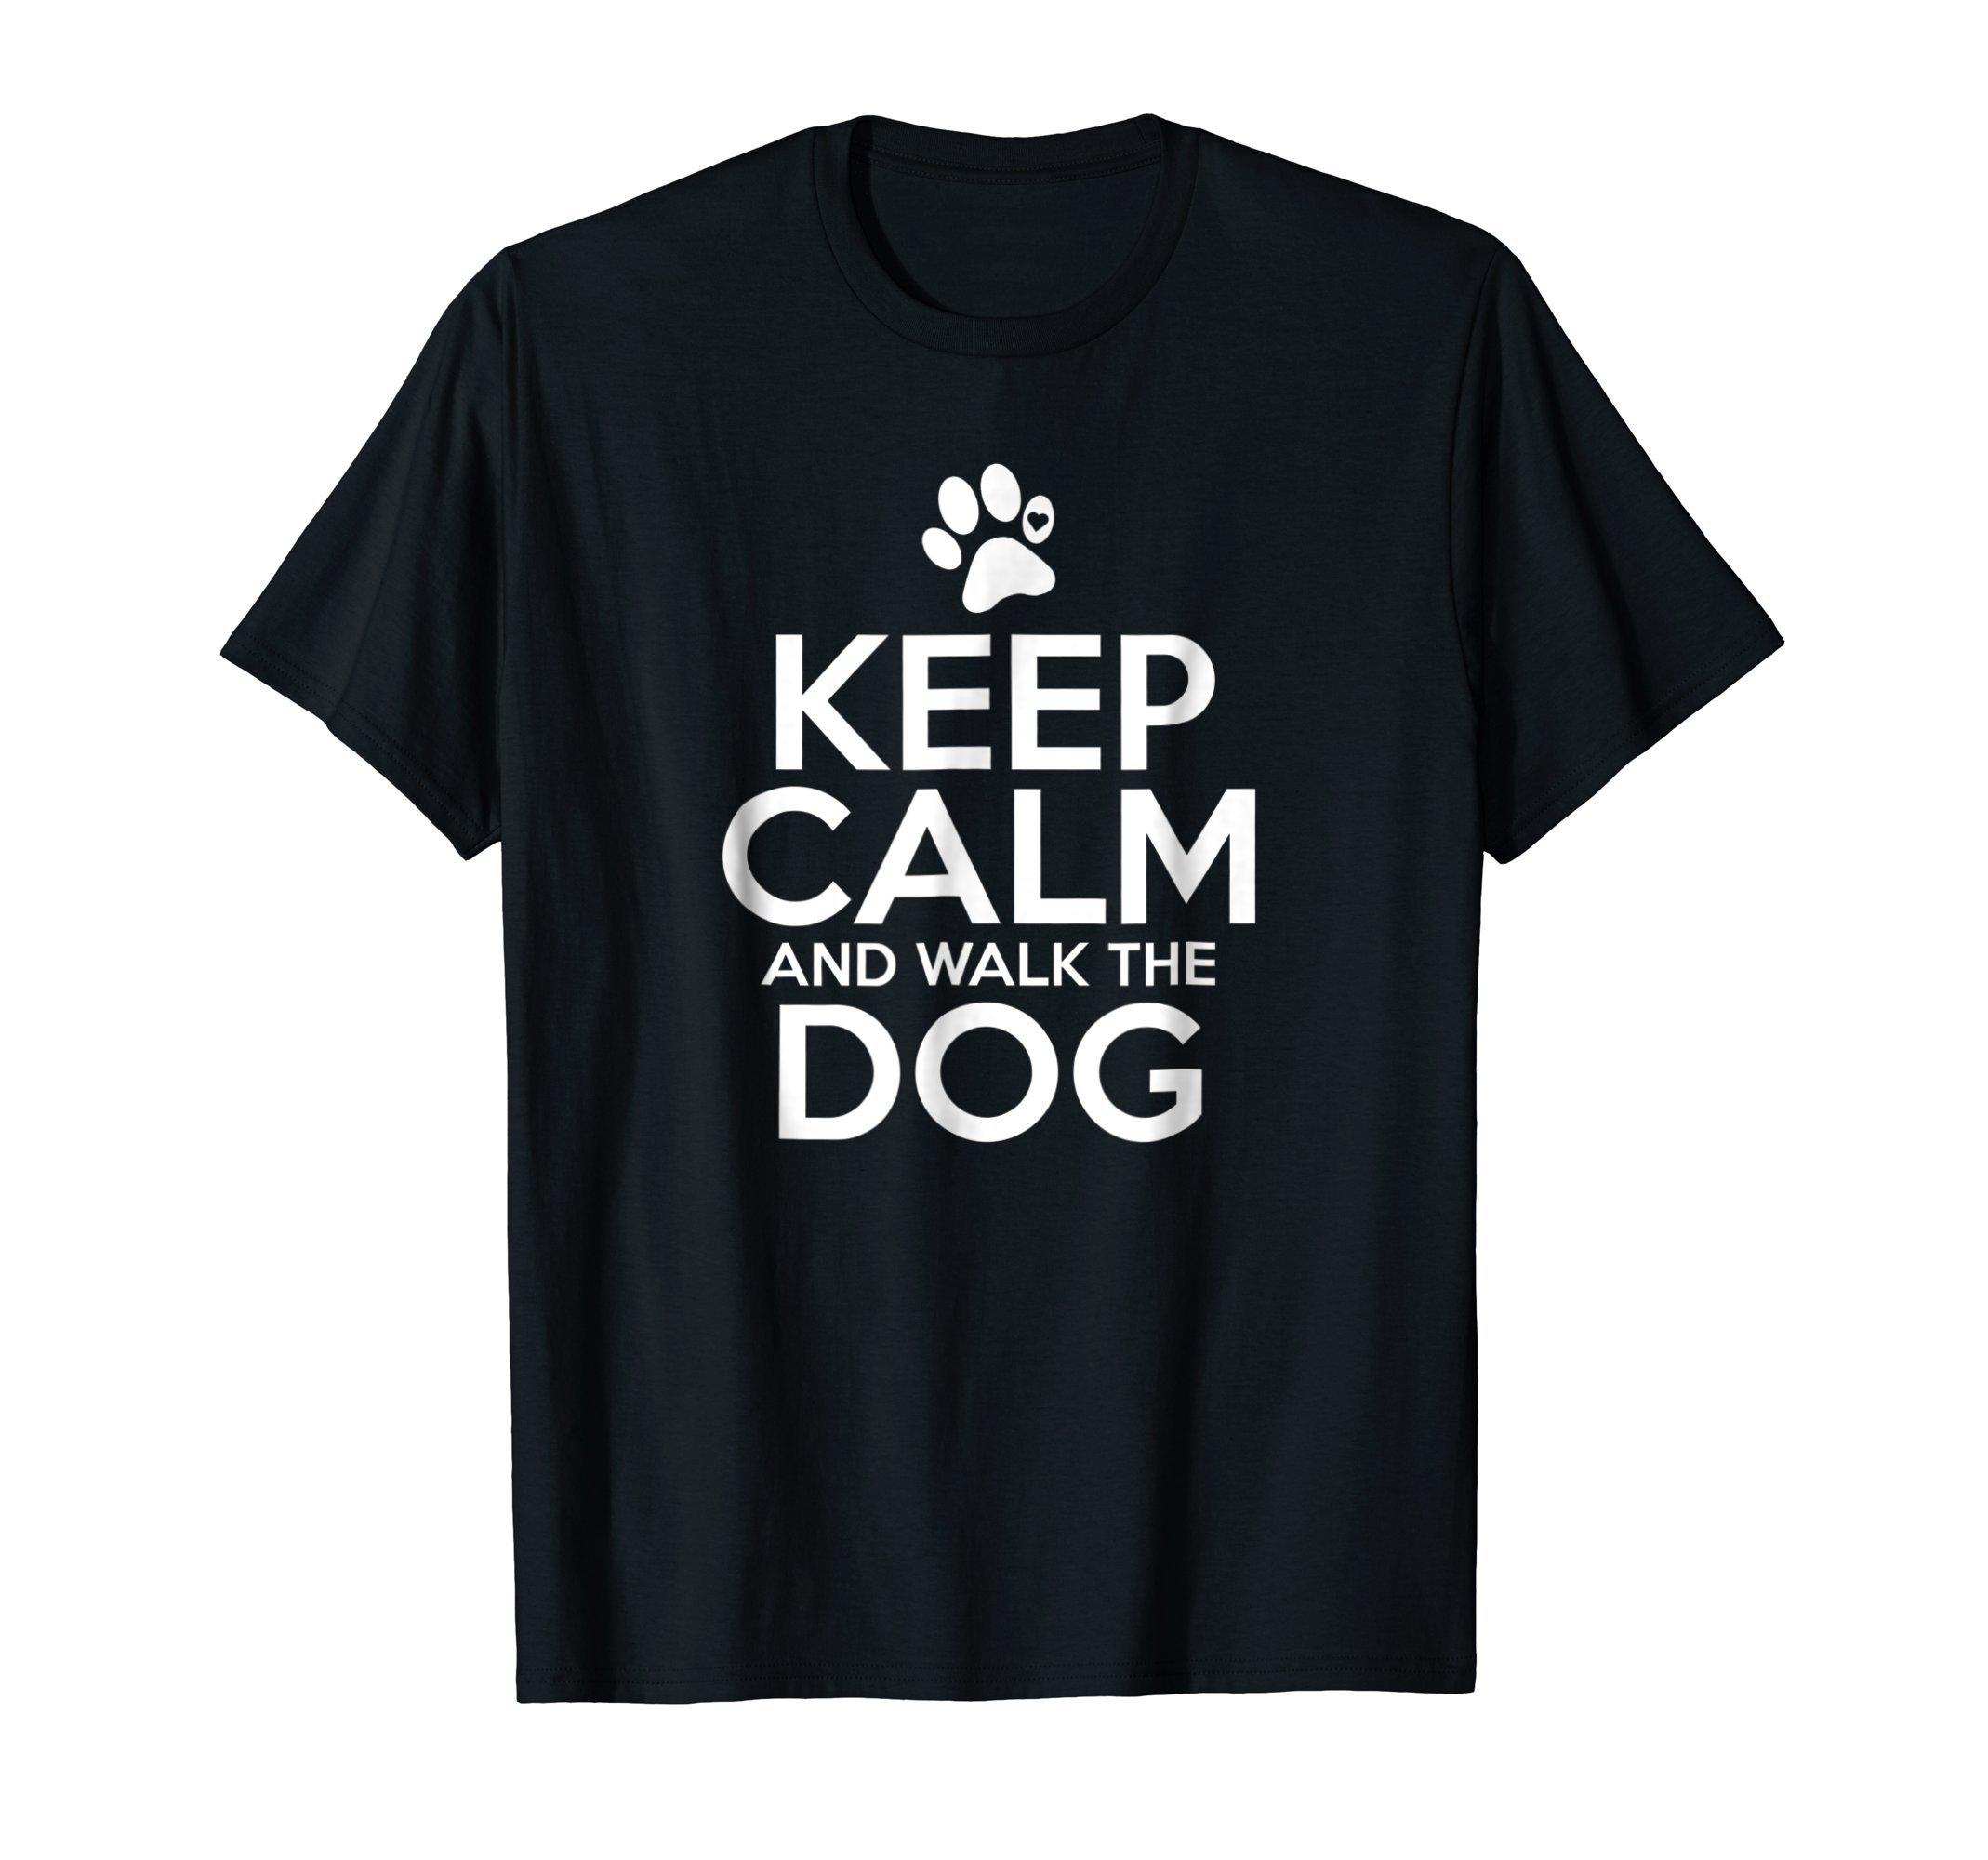 Keep Calm And Walk The Dog, Animal, Pet, Funny - T-Shirt